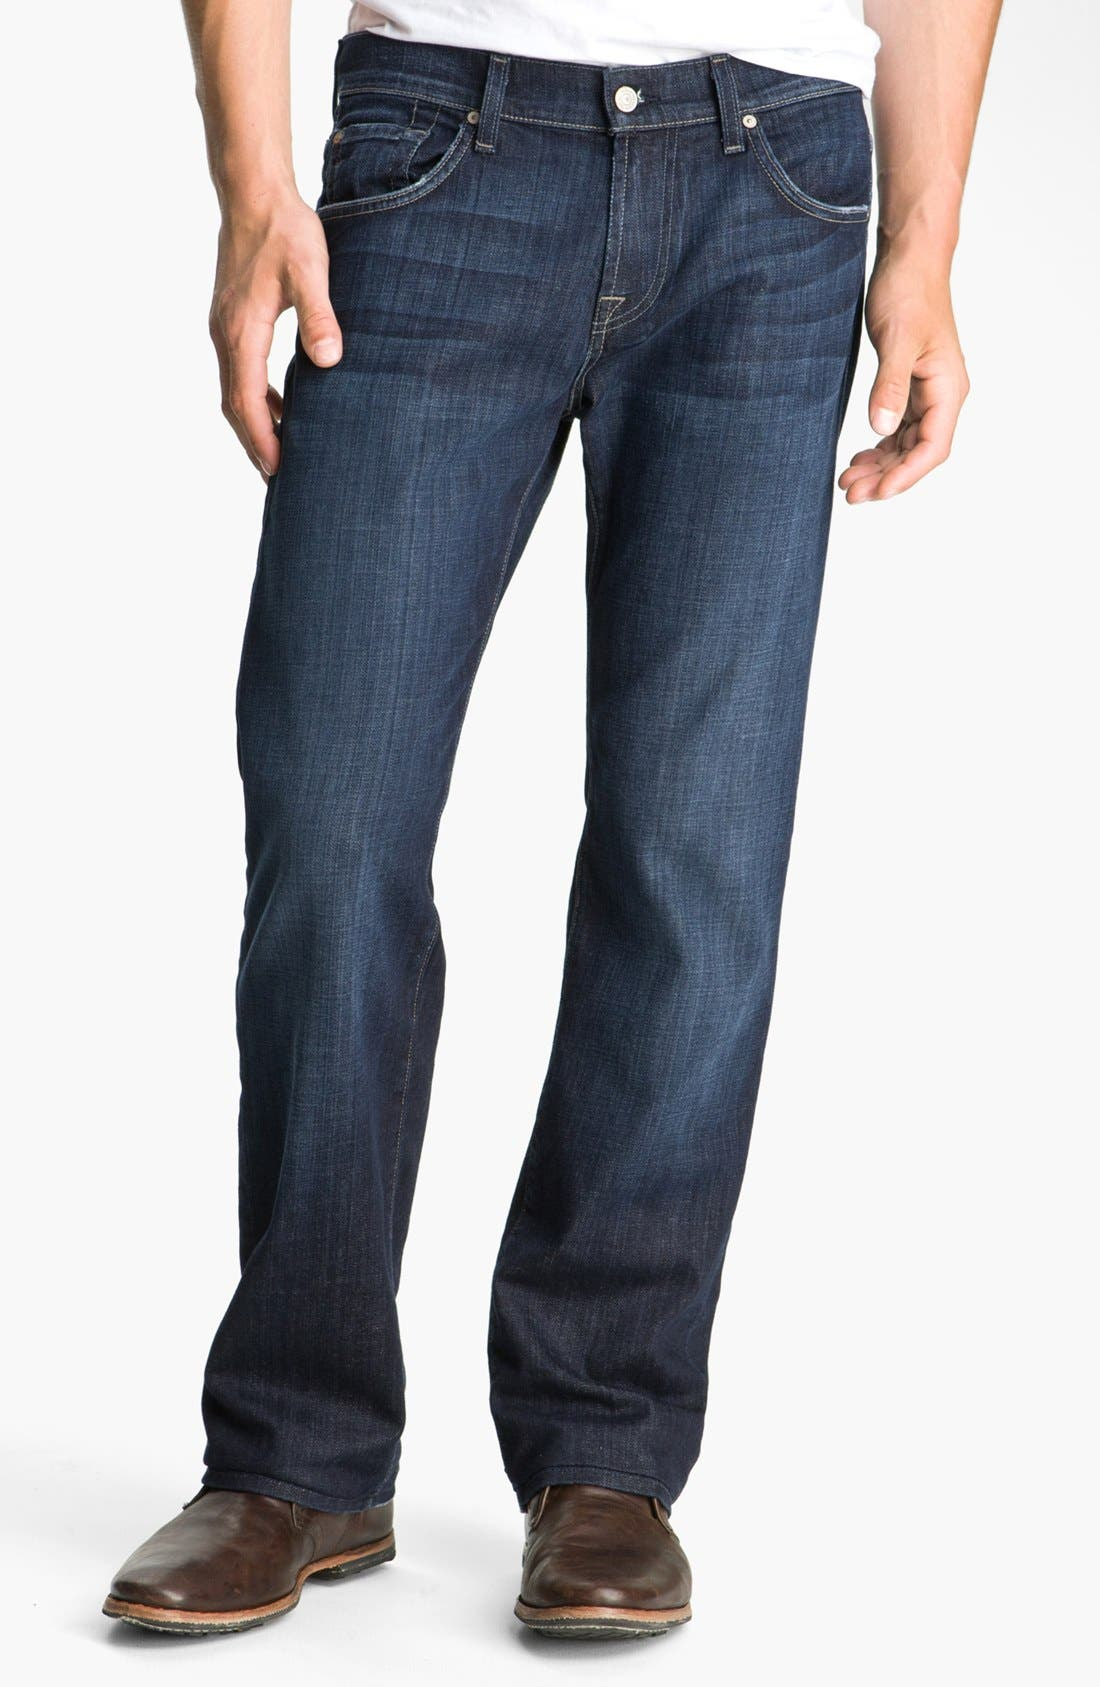 Mens loose bootcut jeans uk